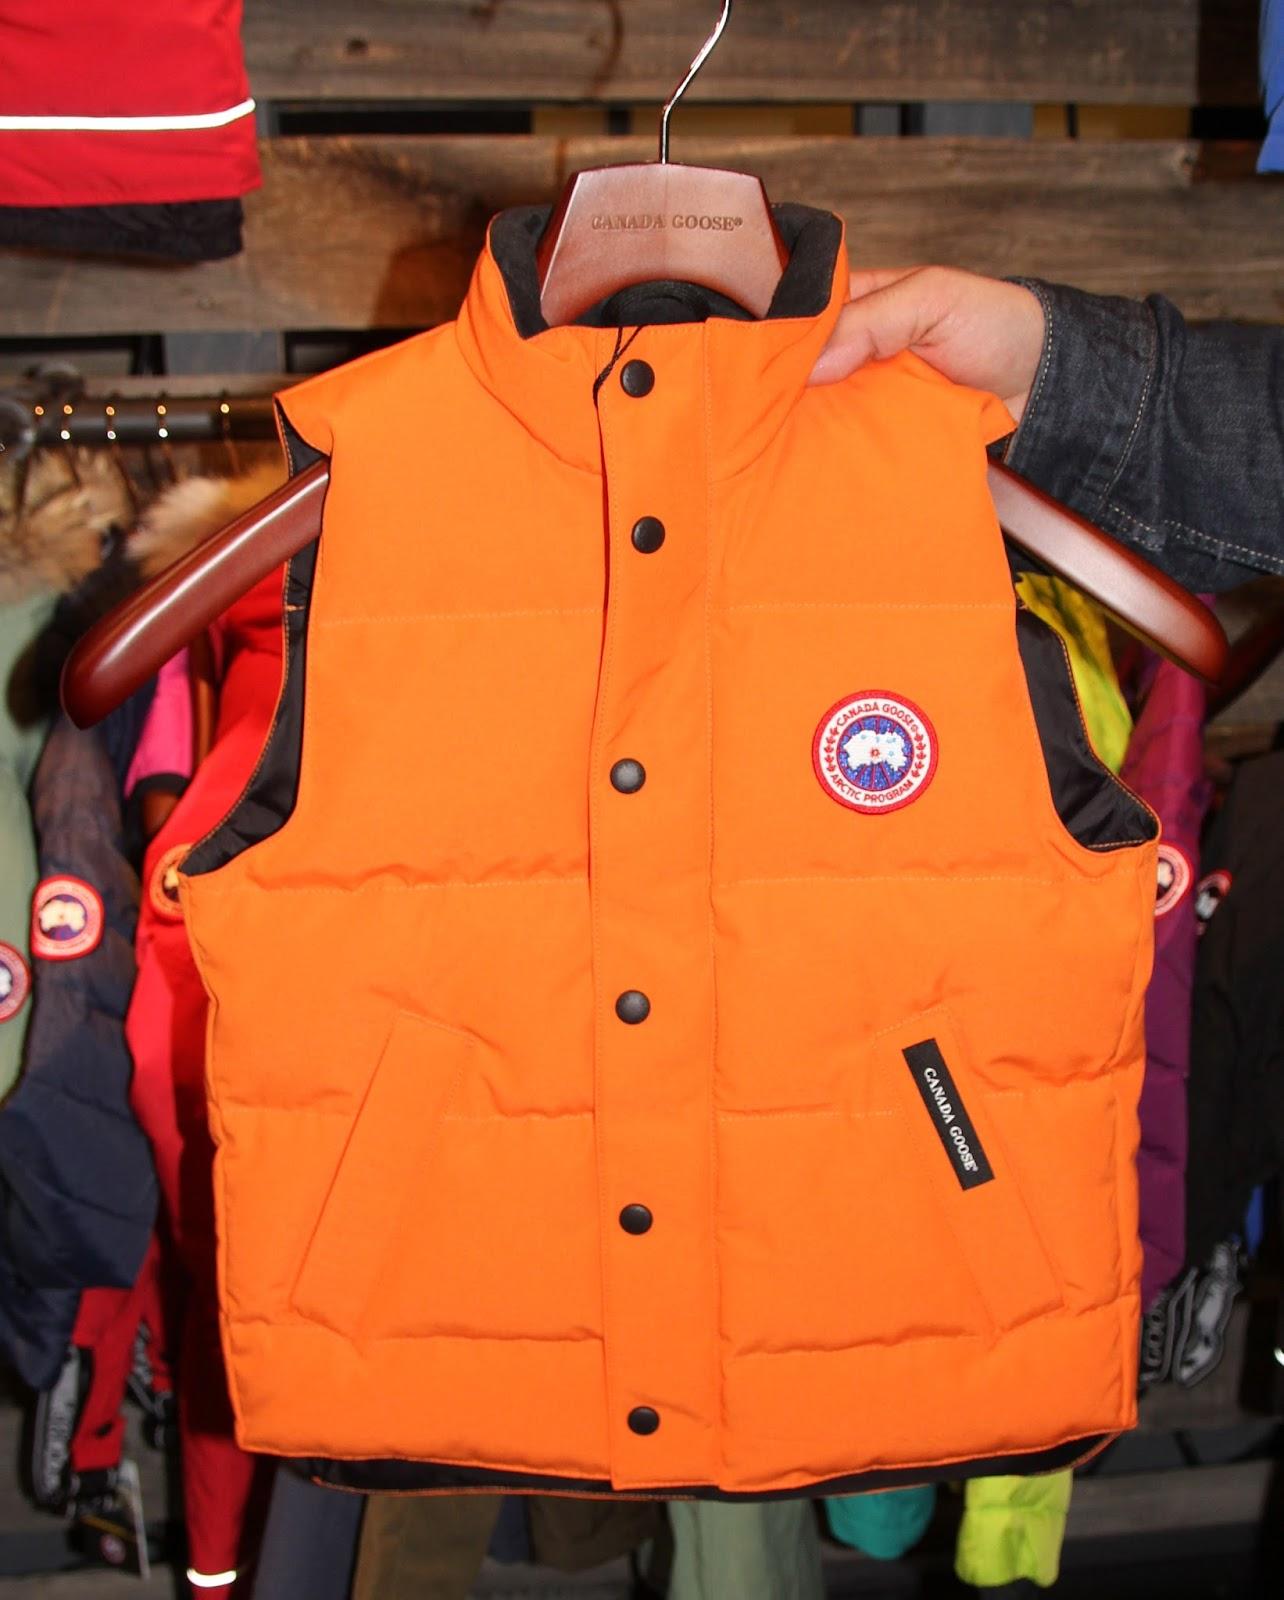 Canada Goose' Men's Lodge Vest - Sunset Orange - Size X Large